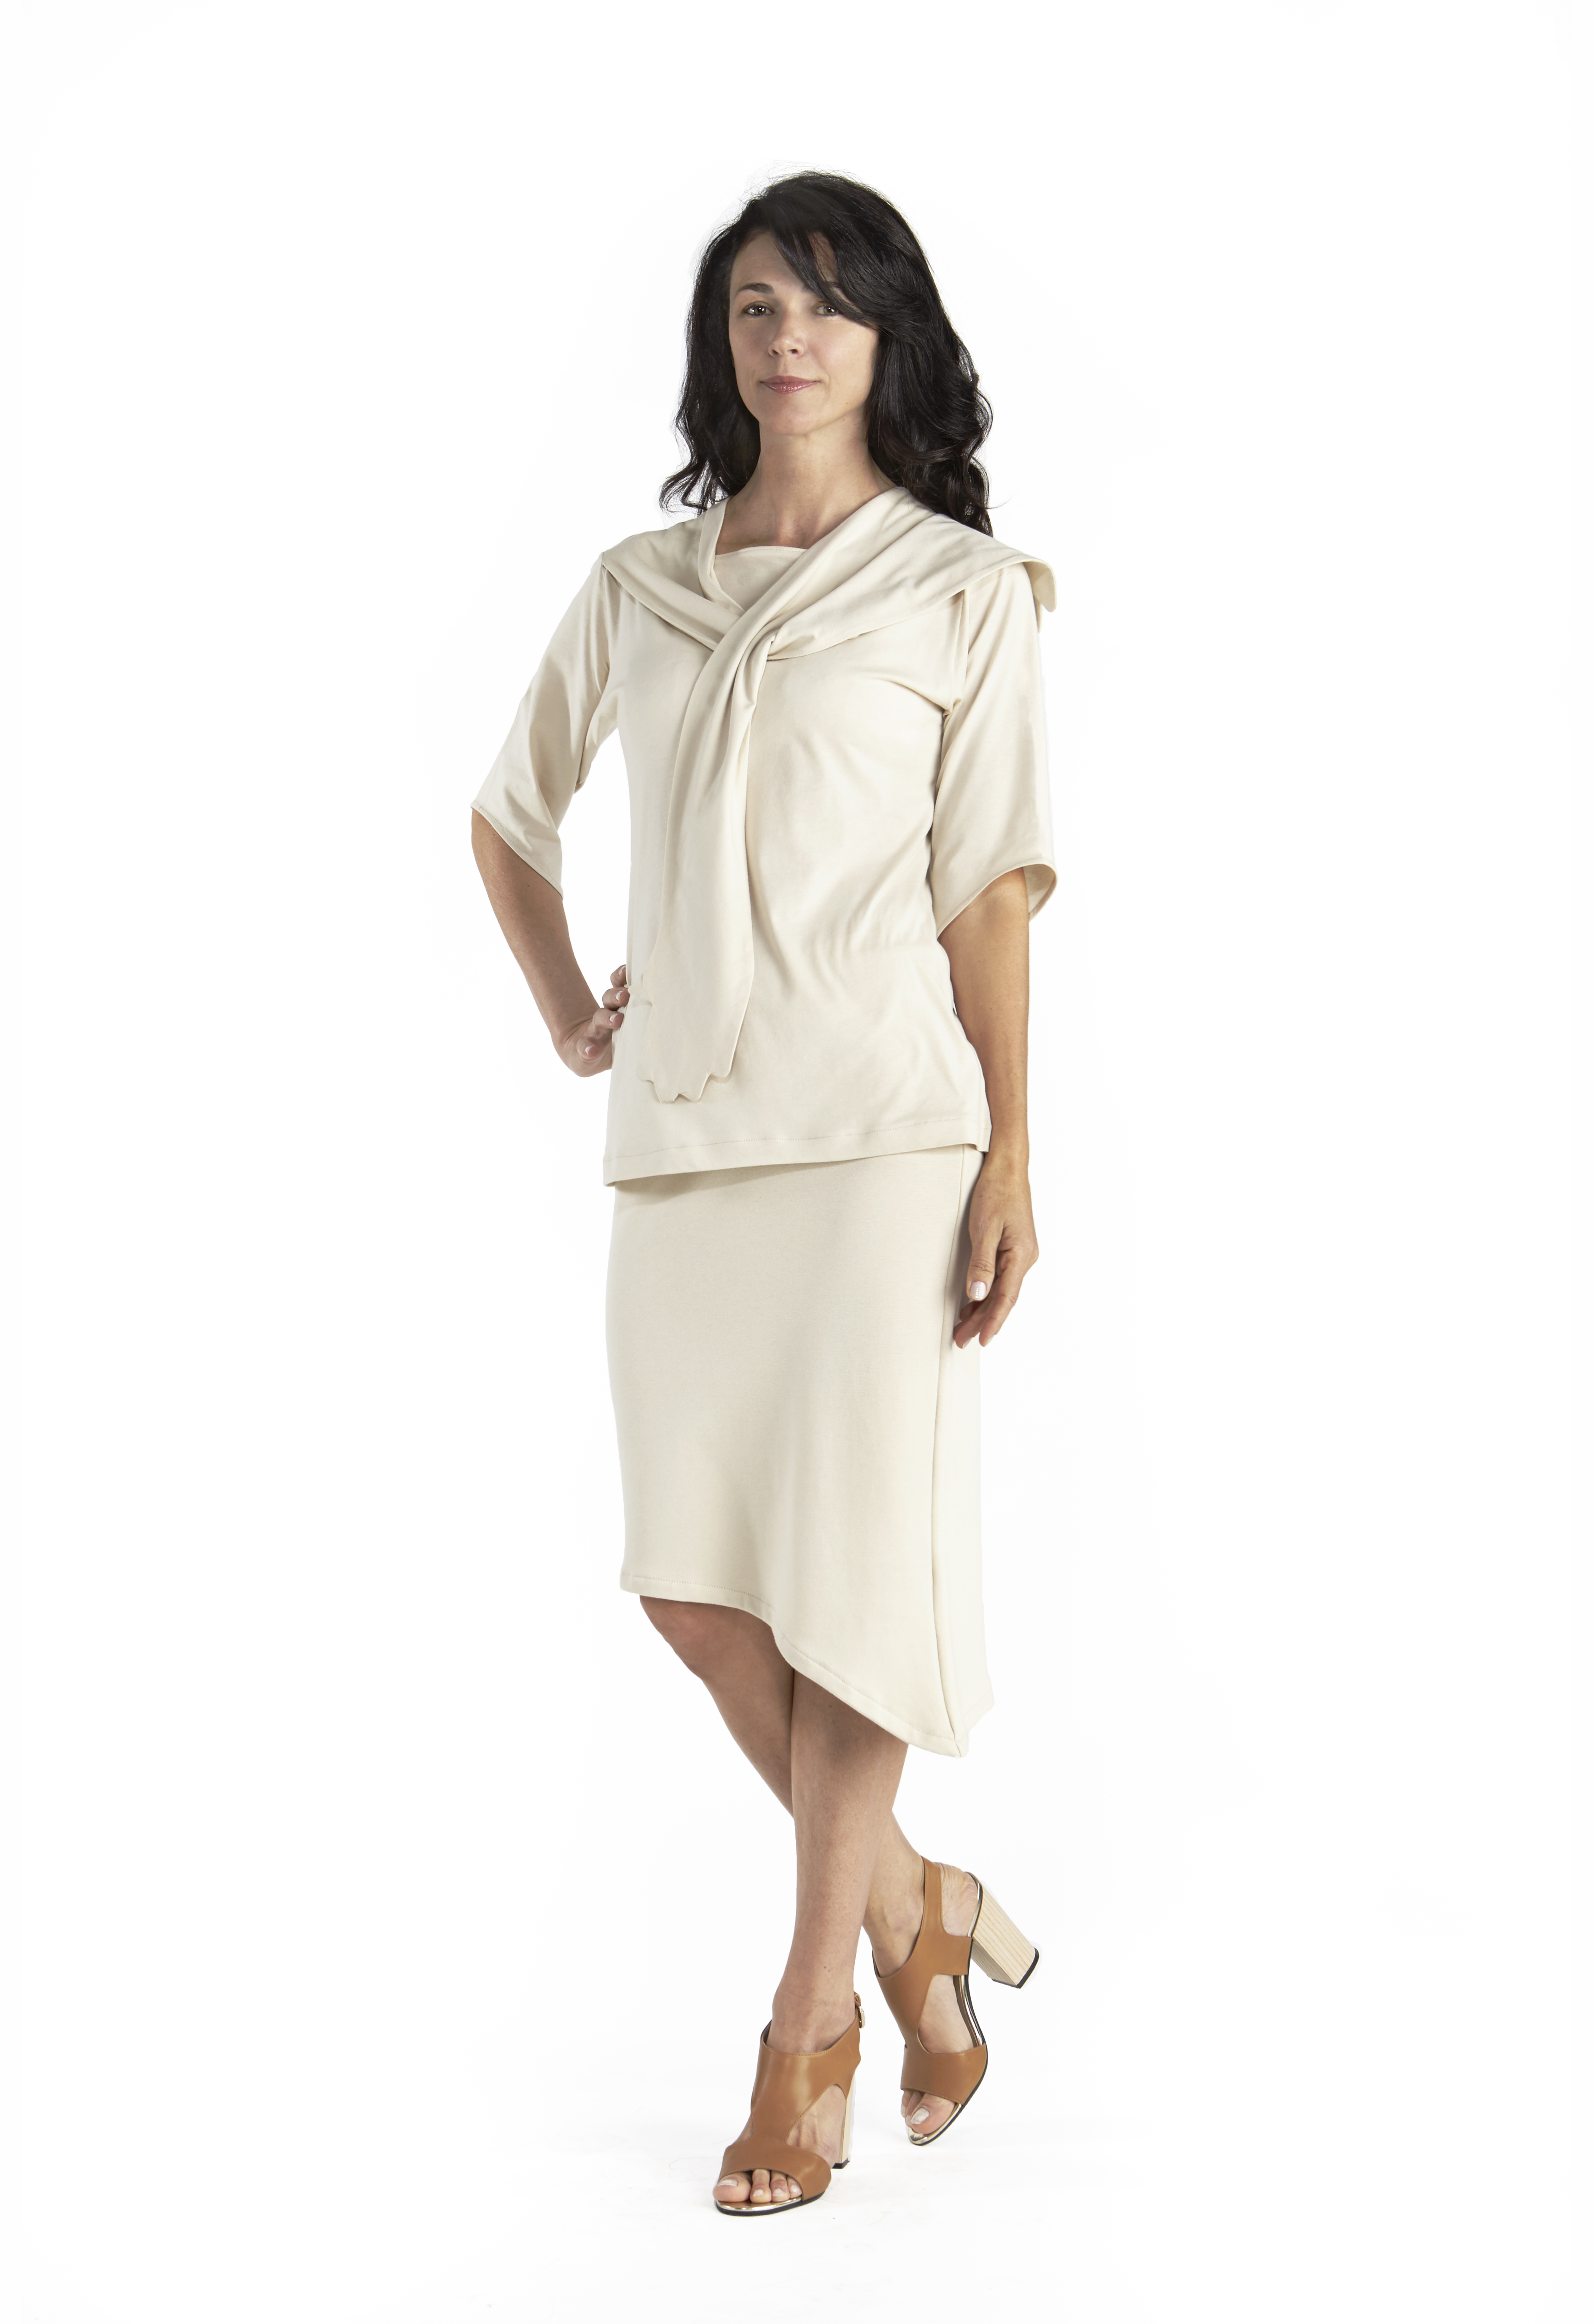 b29f63905cdf Diagonal Jersey Skirt in Pima Cotton - B.e Quality, Responsible ...